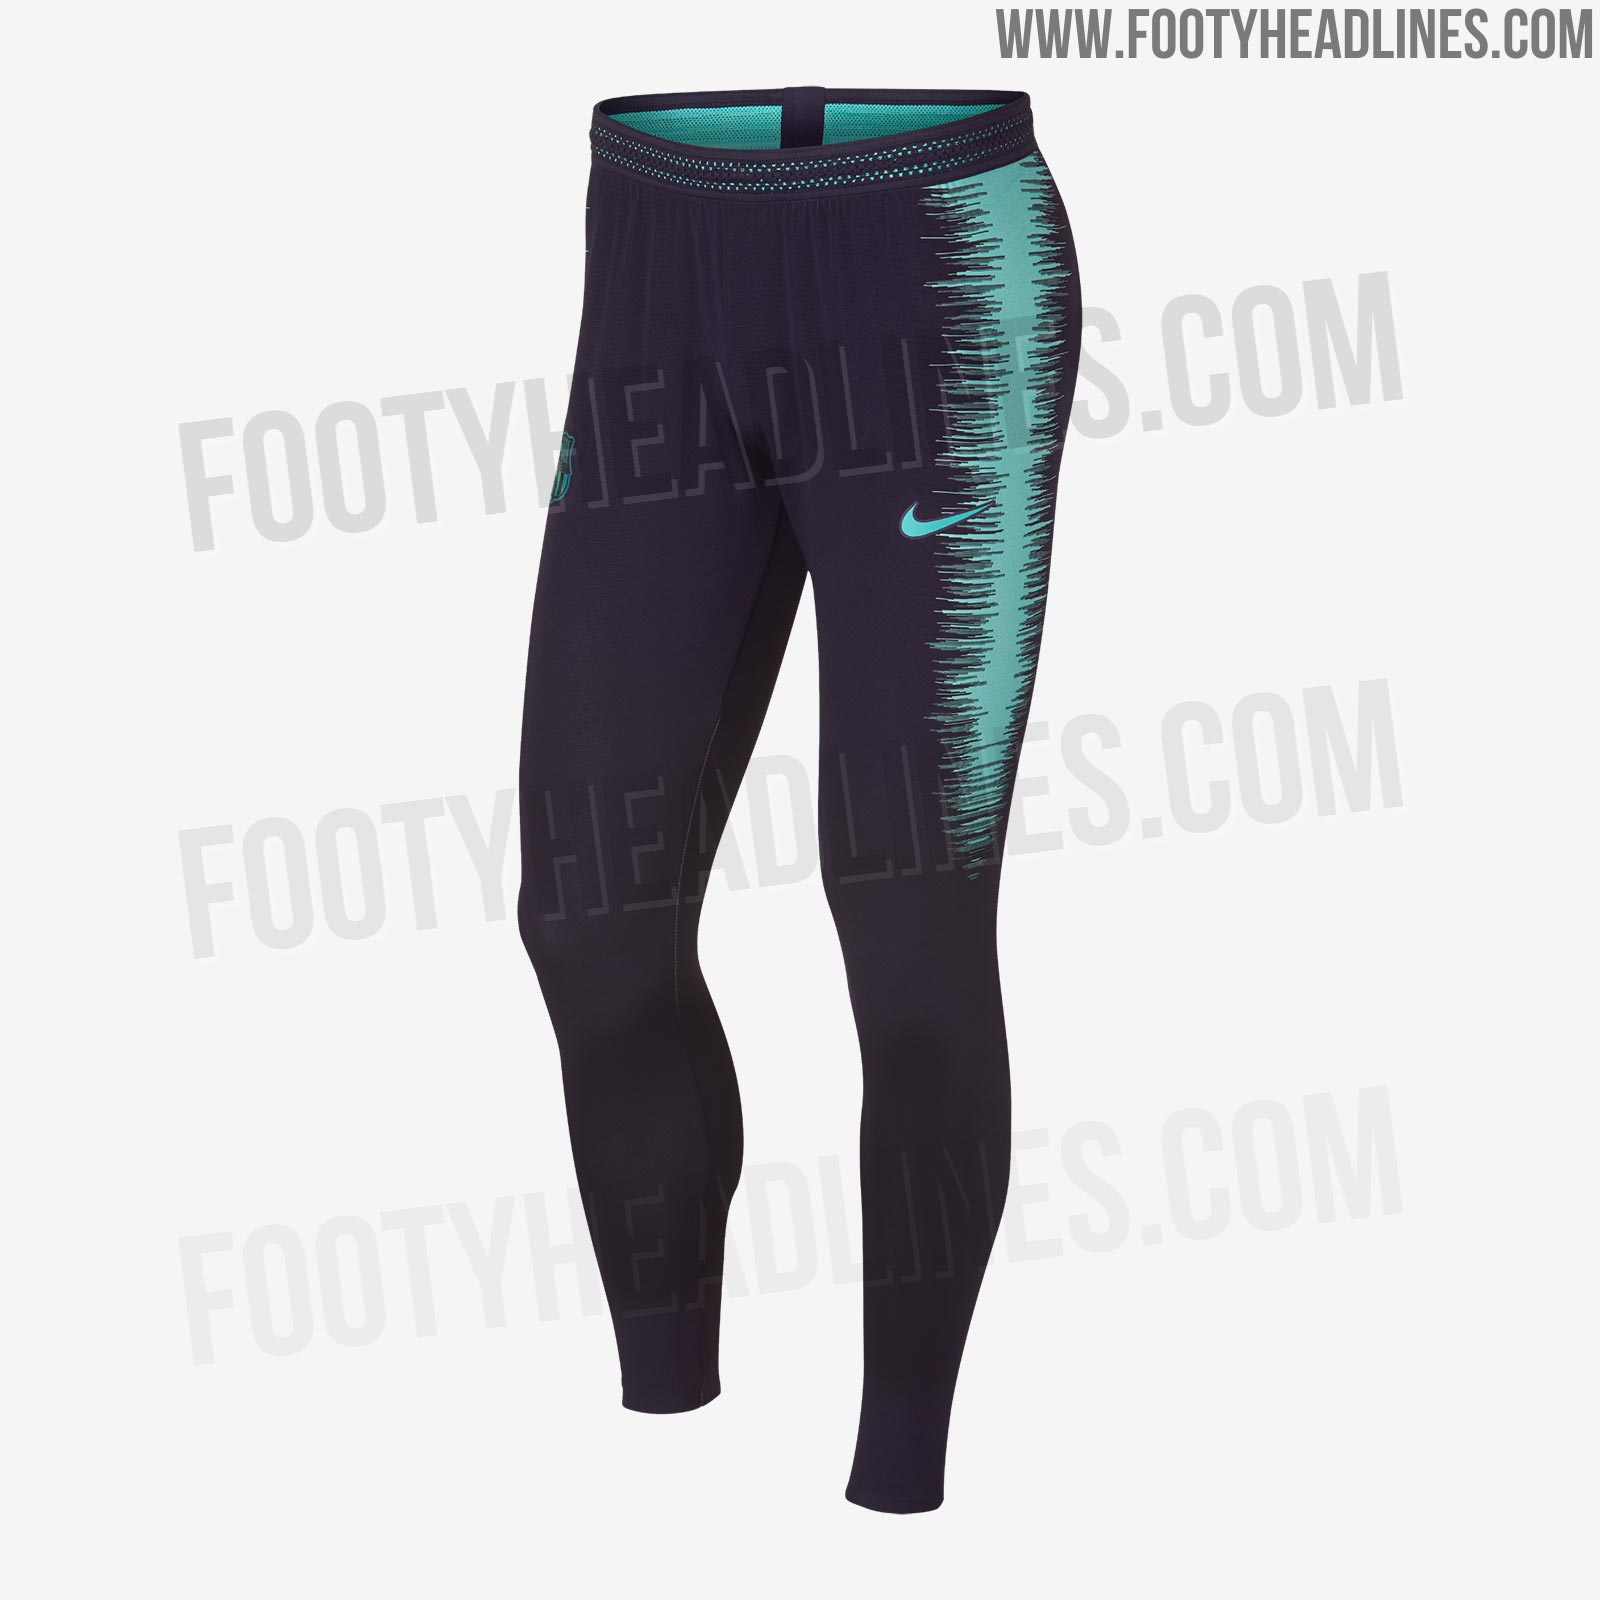 ecdfee09d Stunning Nike Barcelona 18-19 Training Kit Leaked